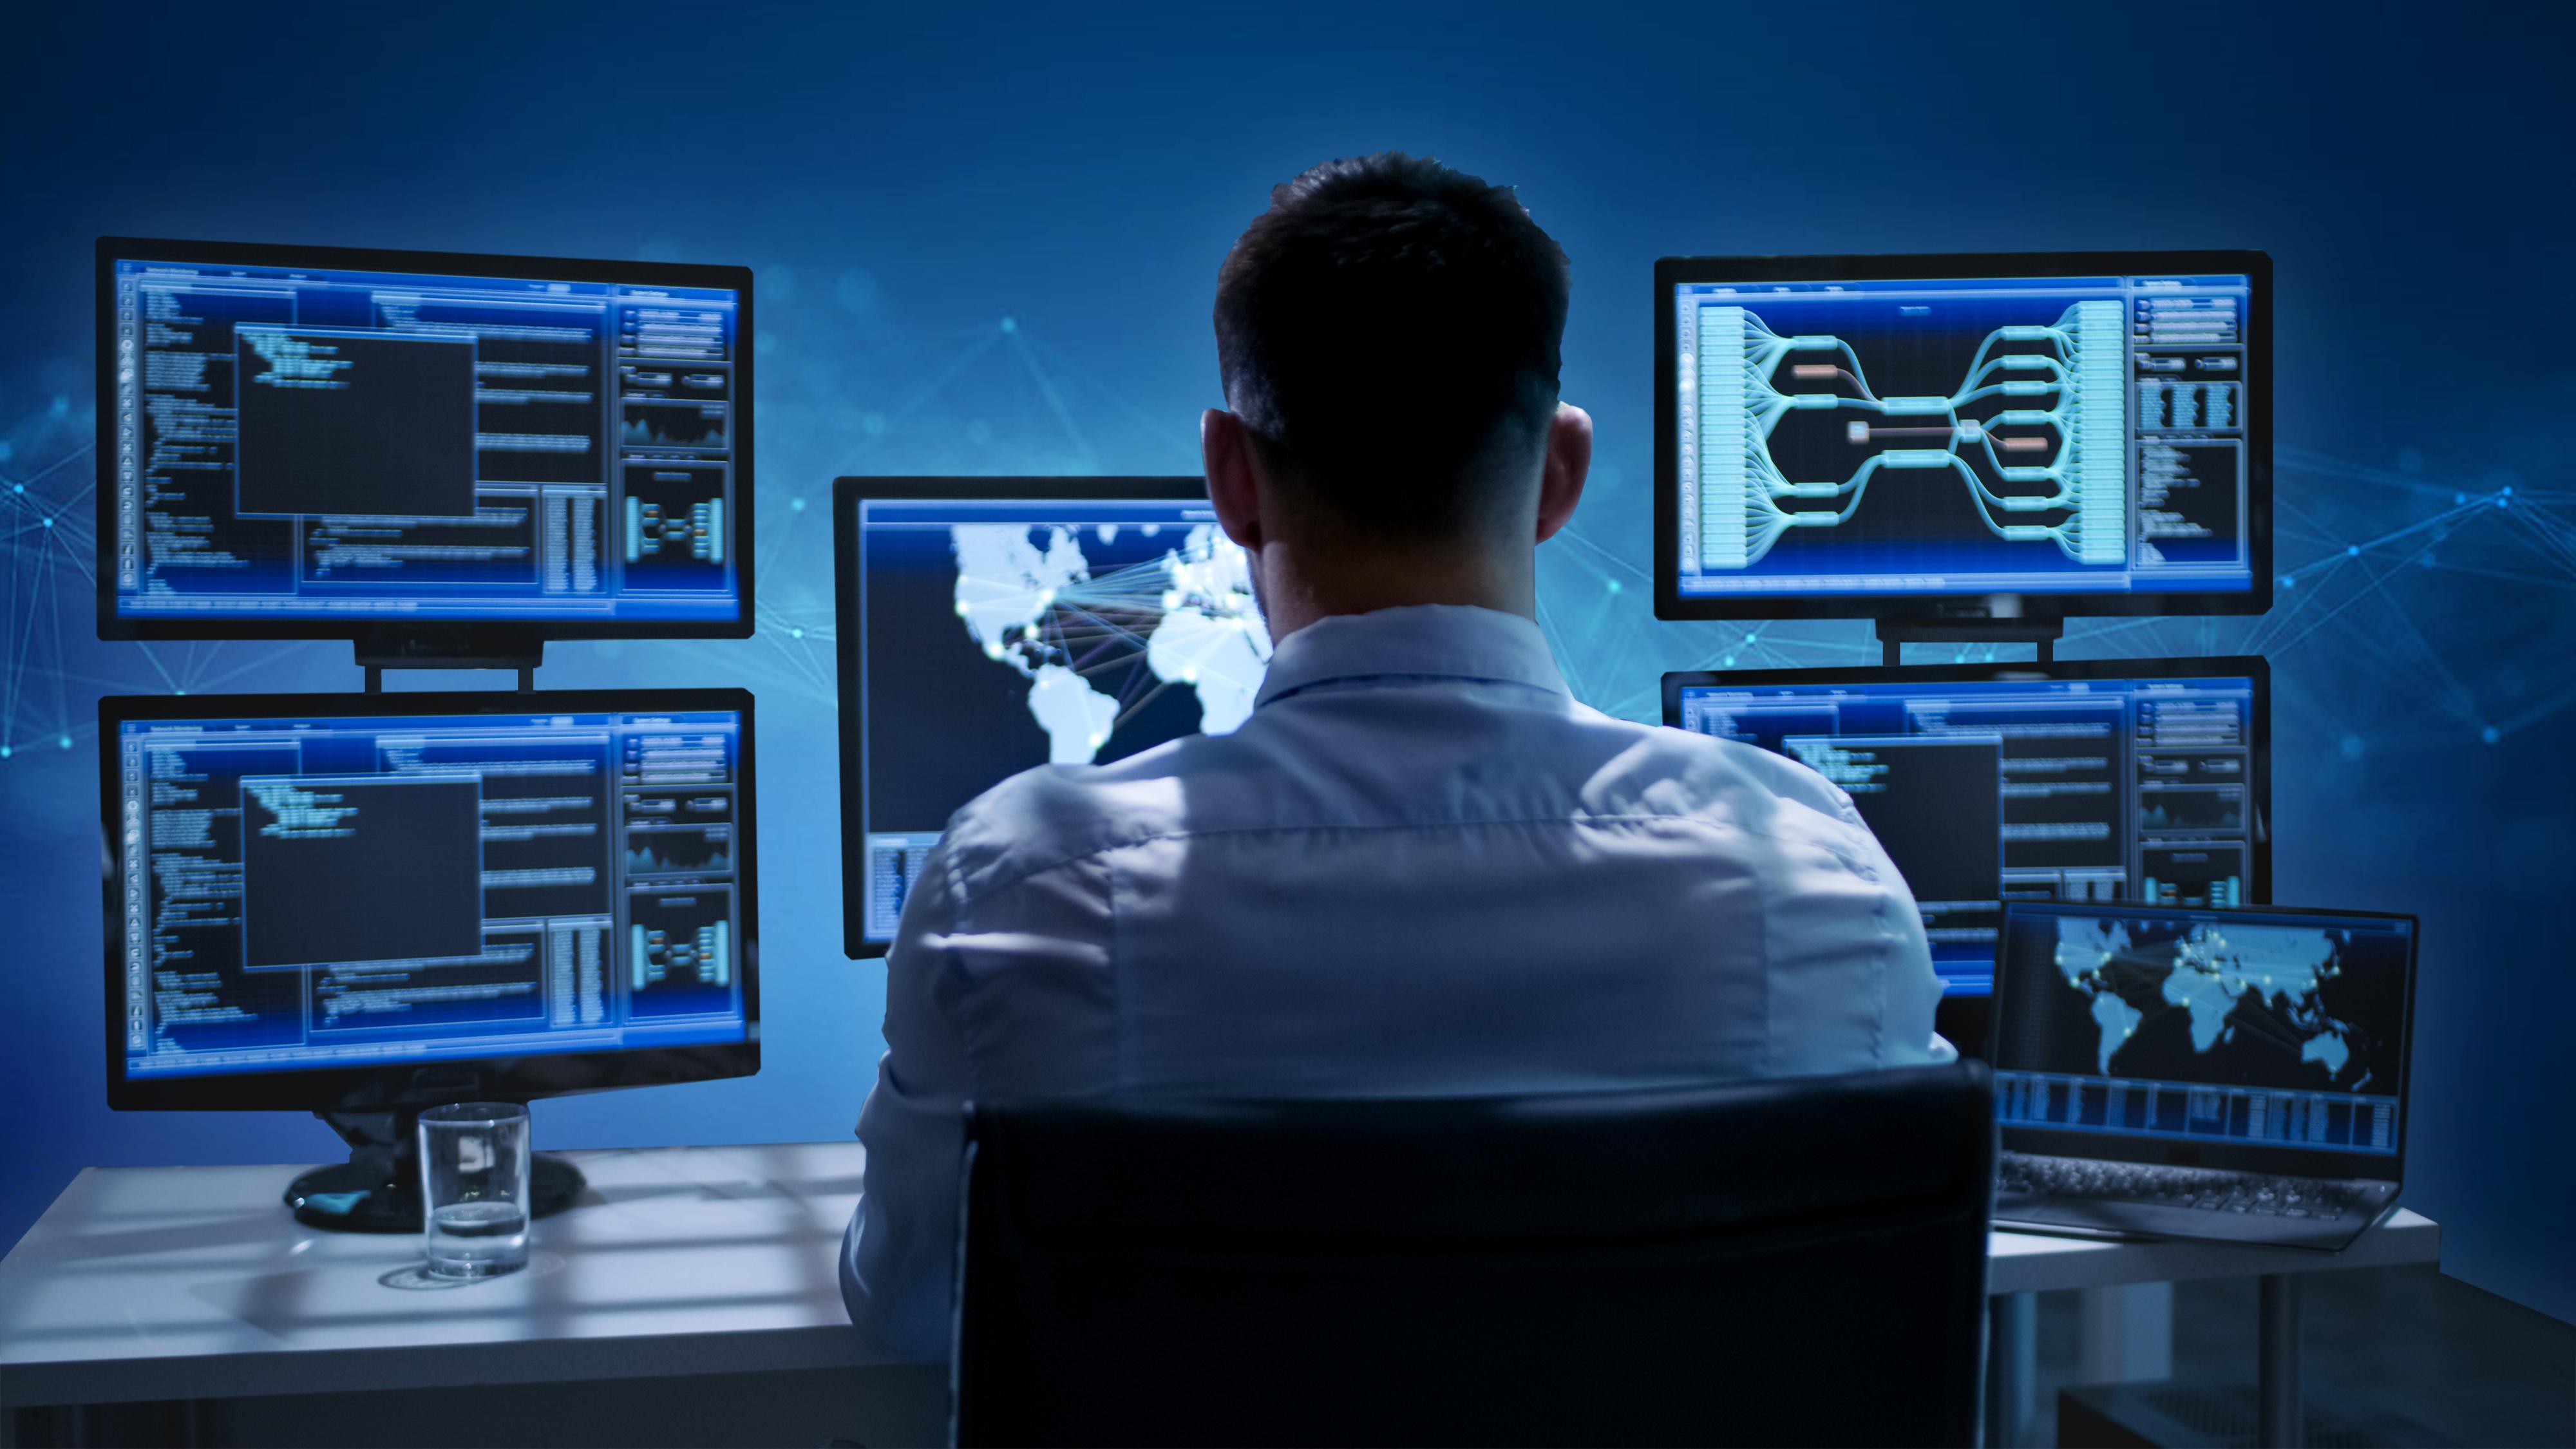 Intel's Latest AI Platform Takes Aim at Financial Crooks